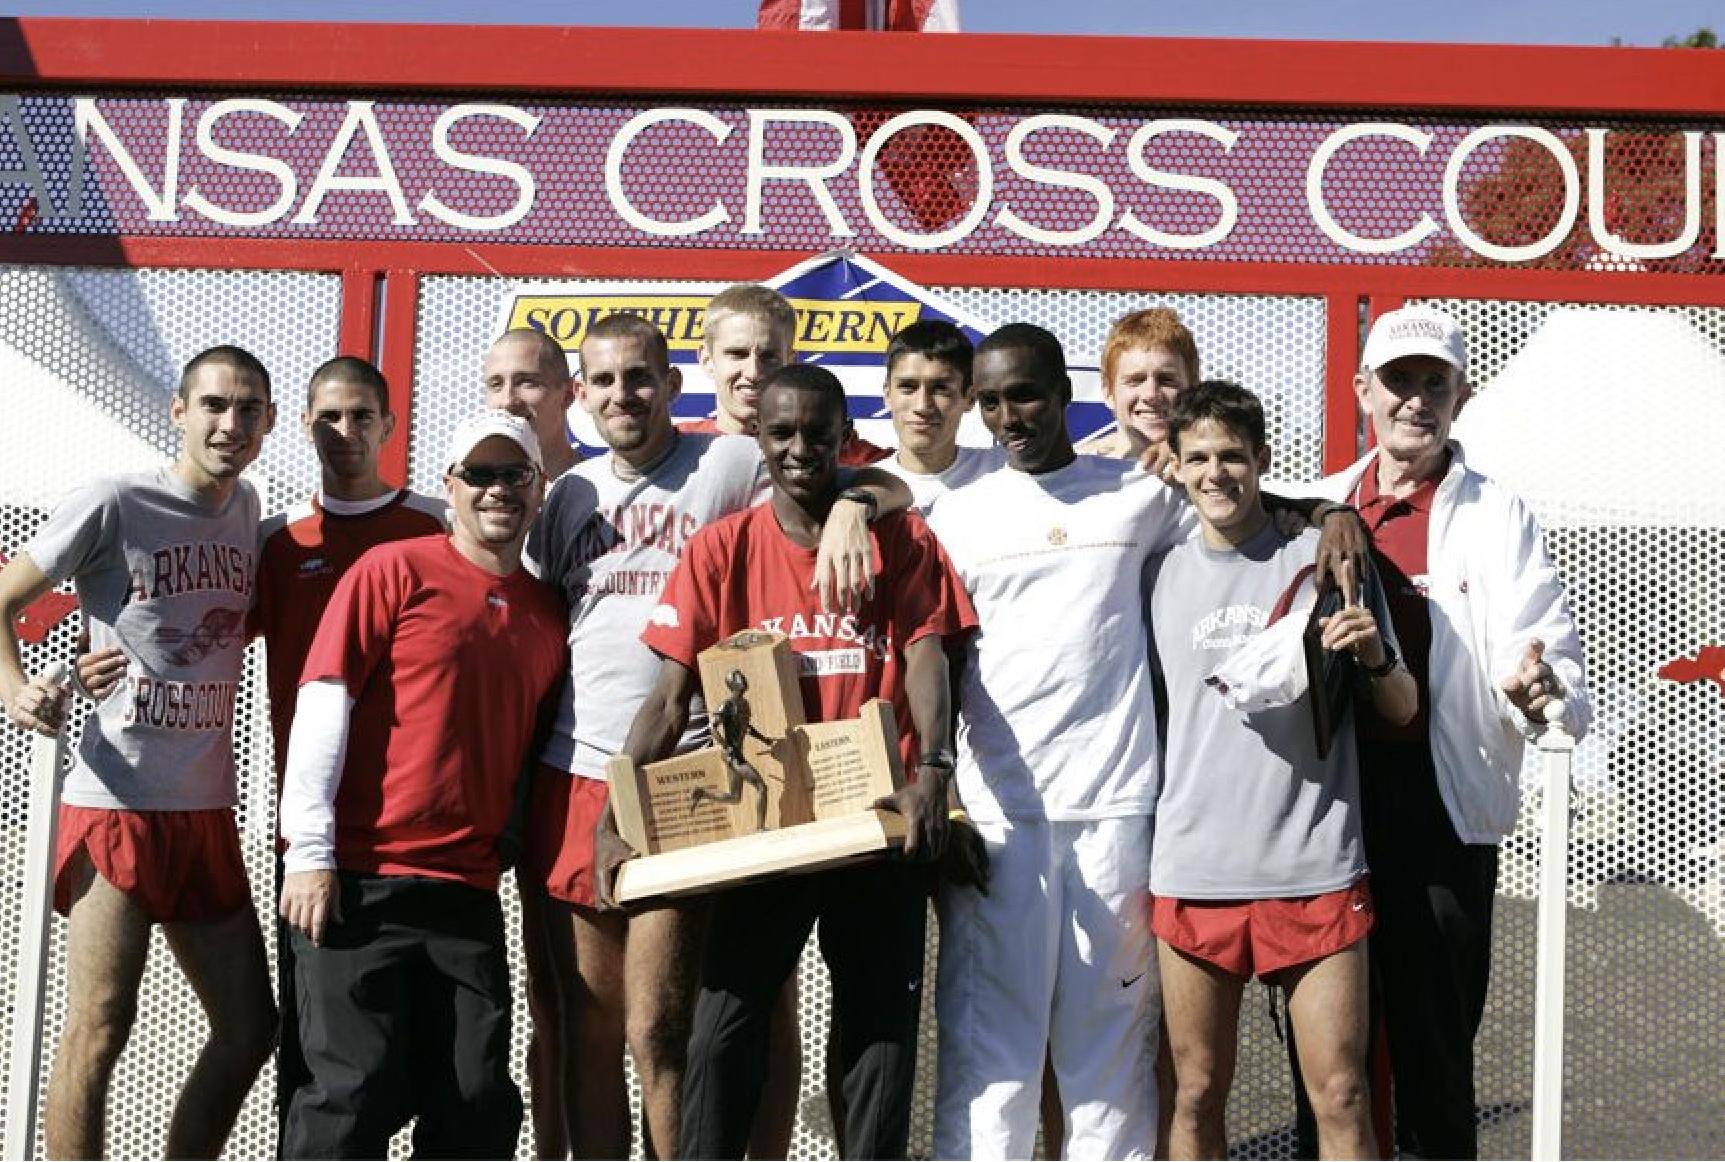 2005 SEC XC Champions